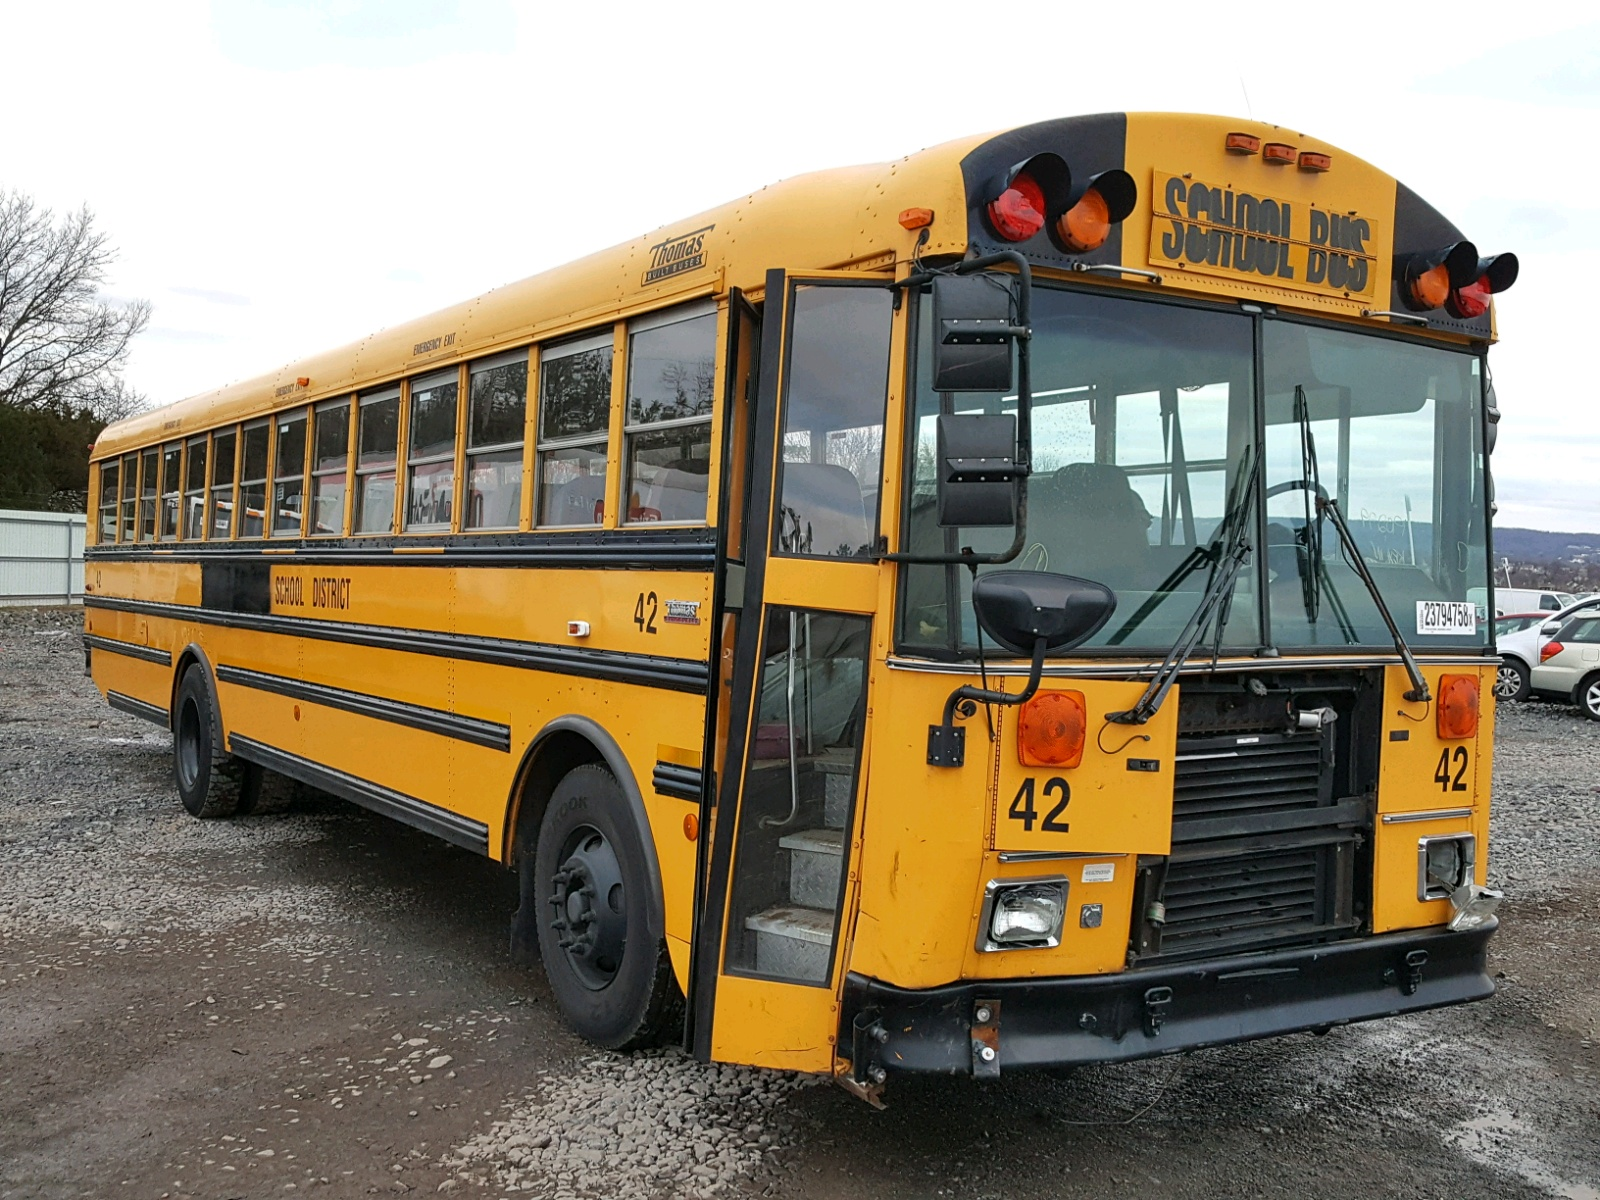 2004 THOMAS SCHOOL BUS 6